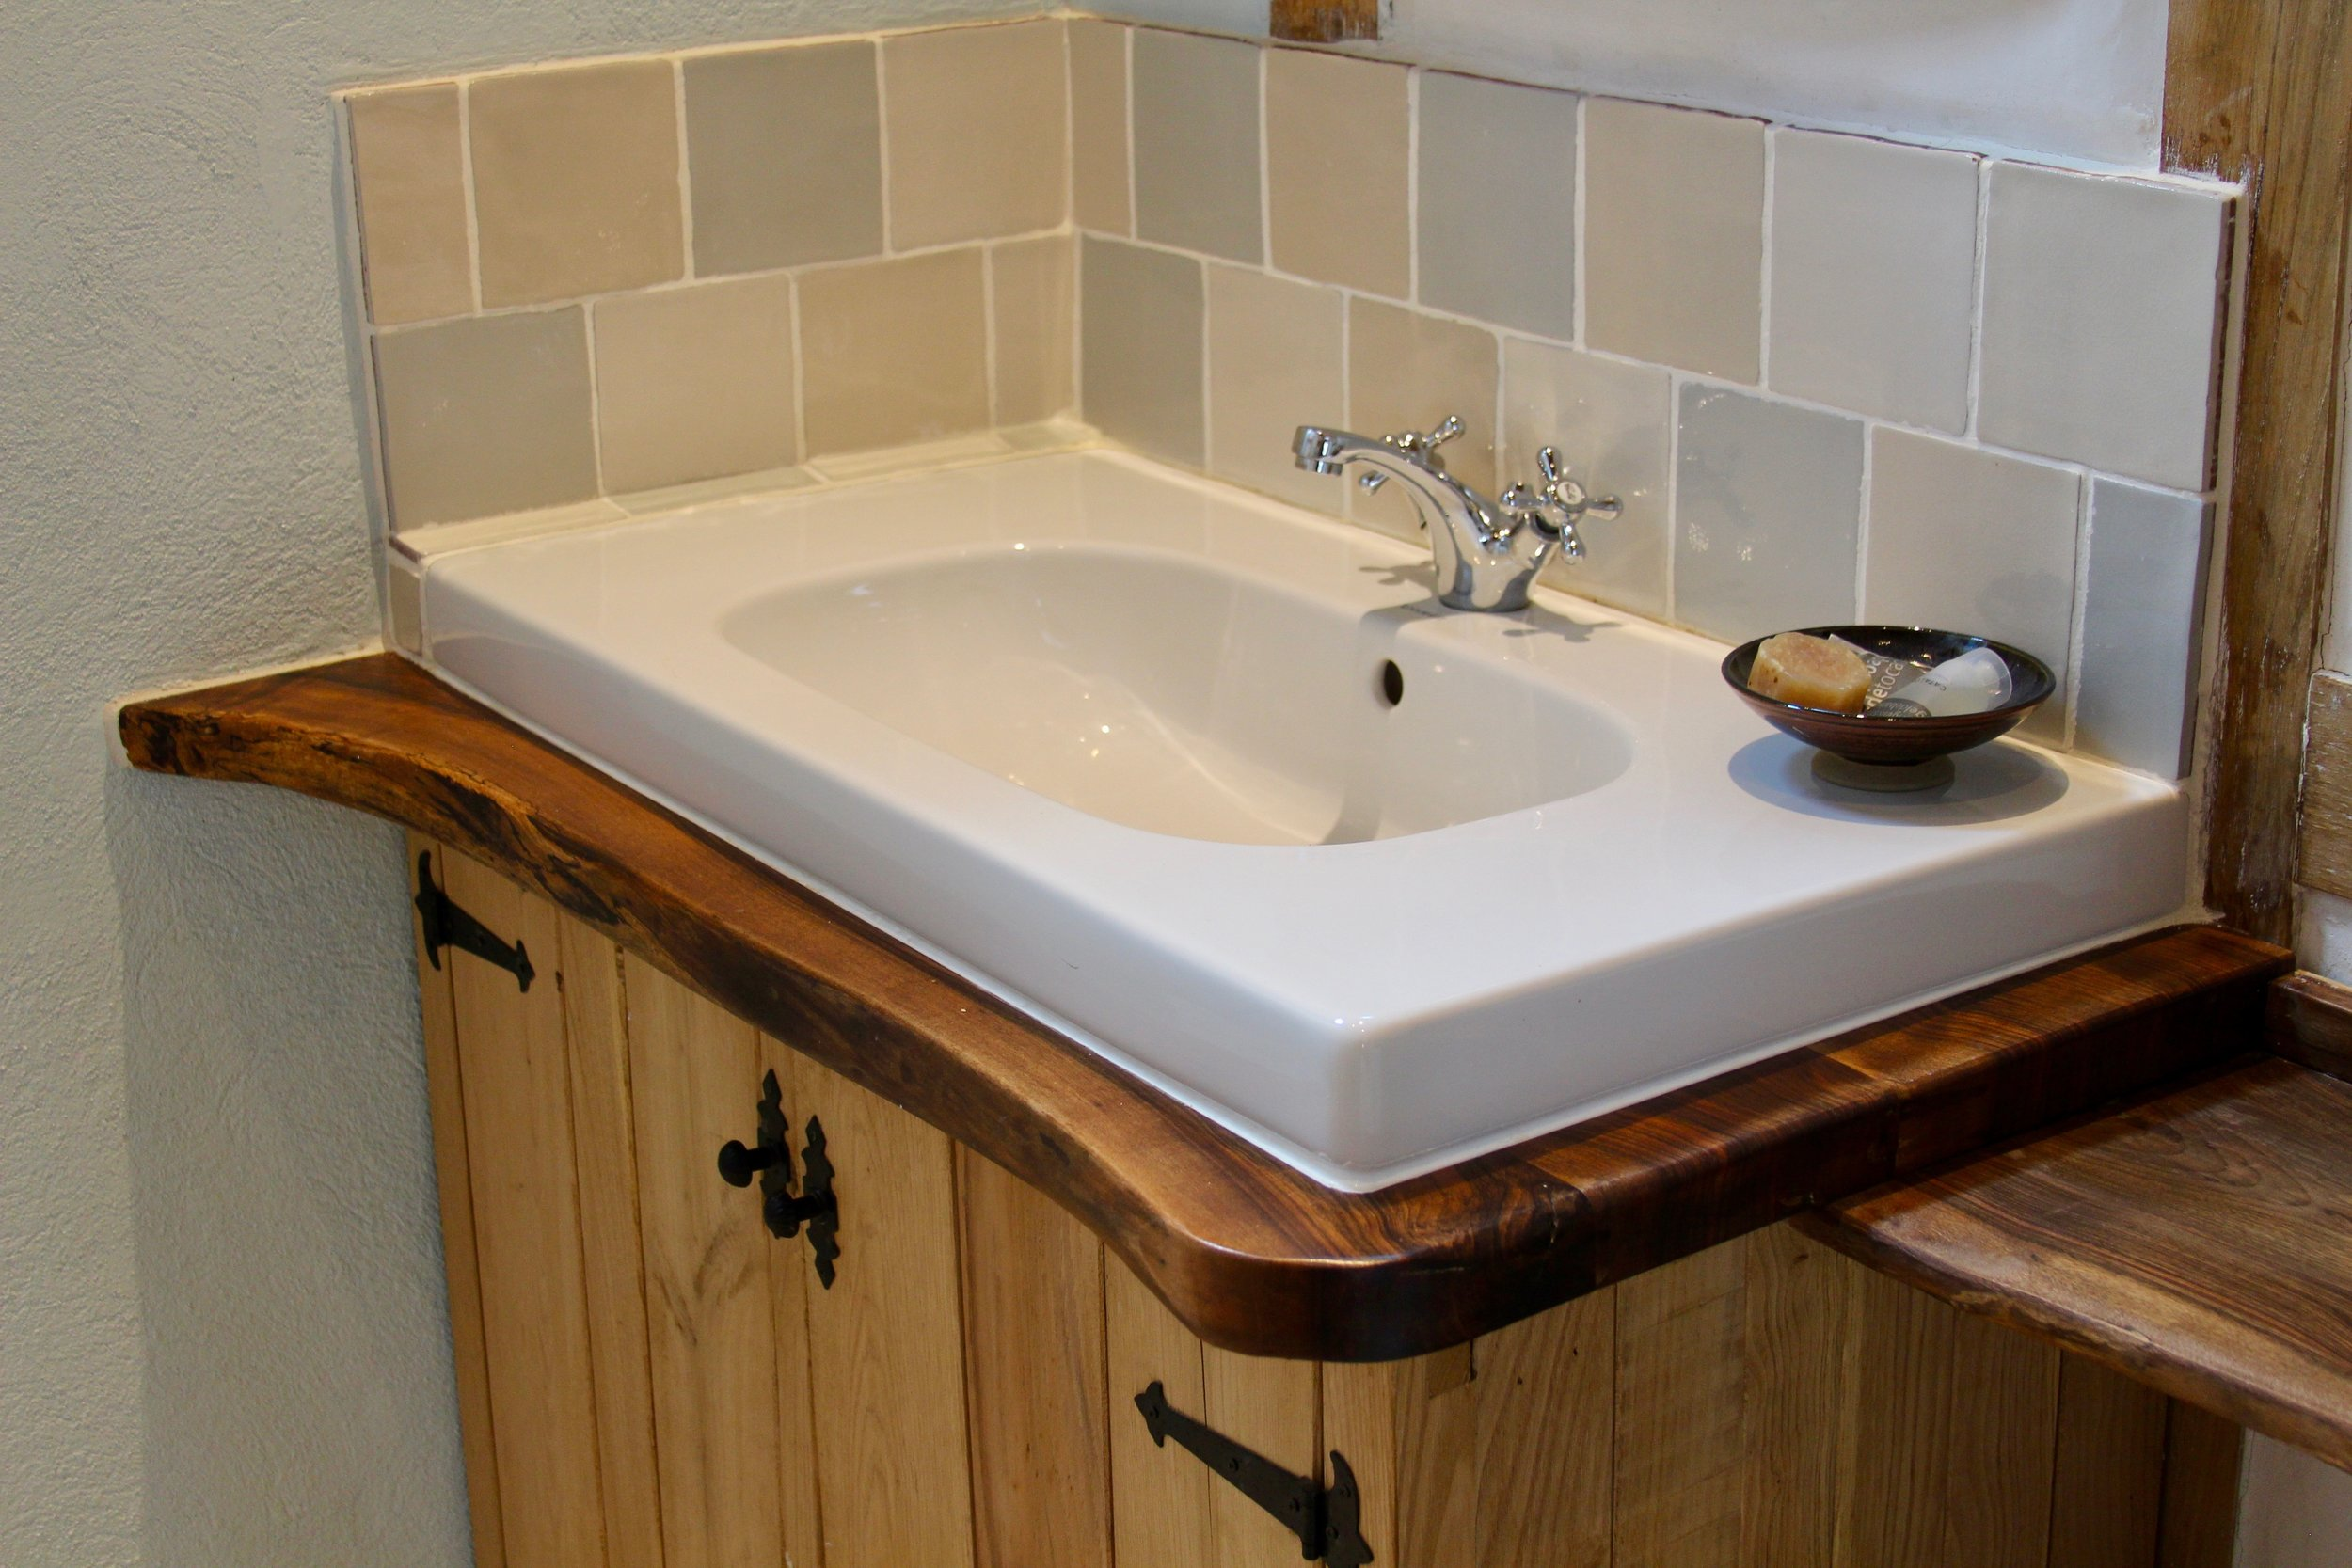 Rustic walnut washbasin surrouns